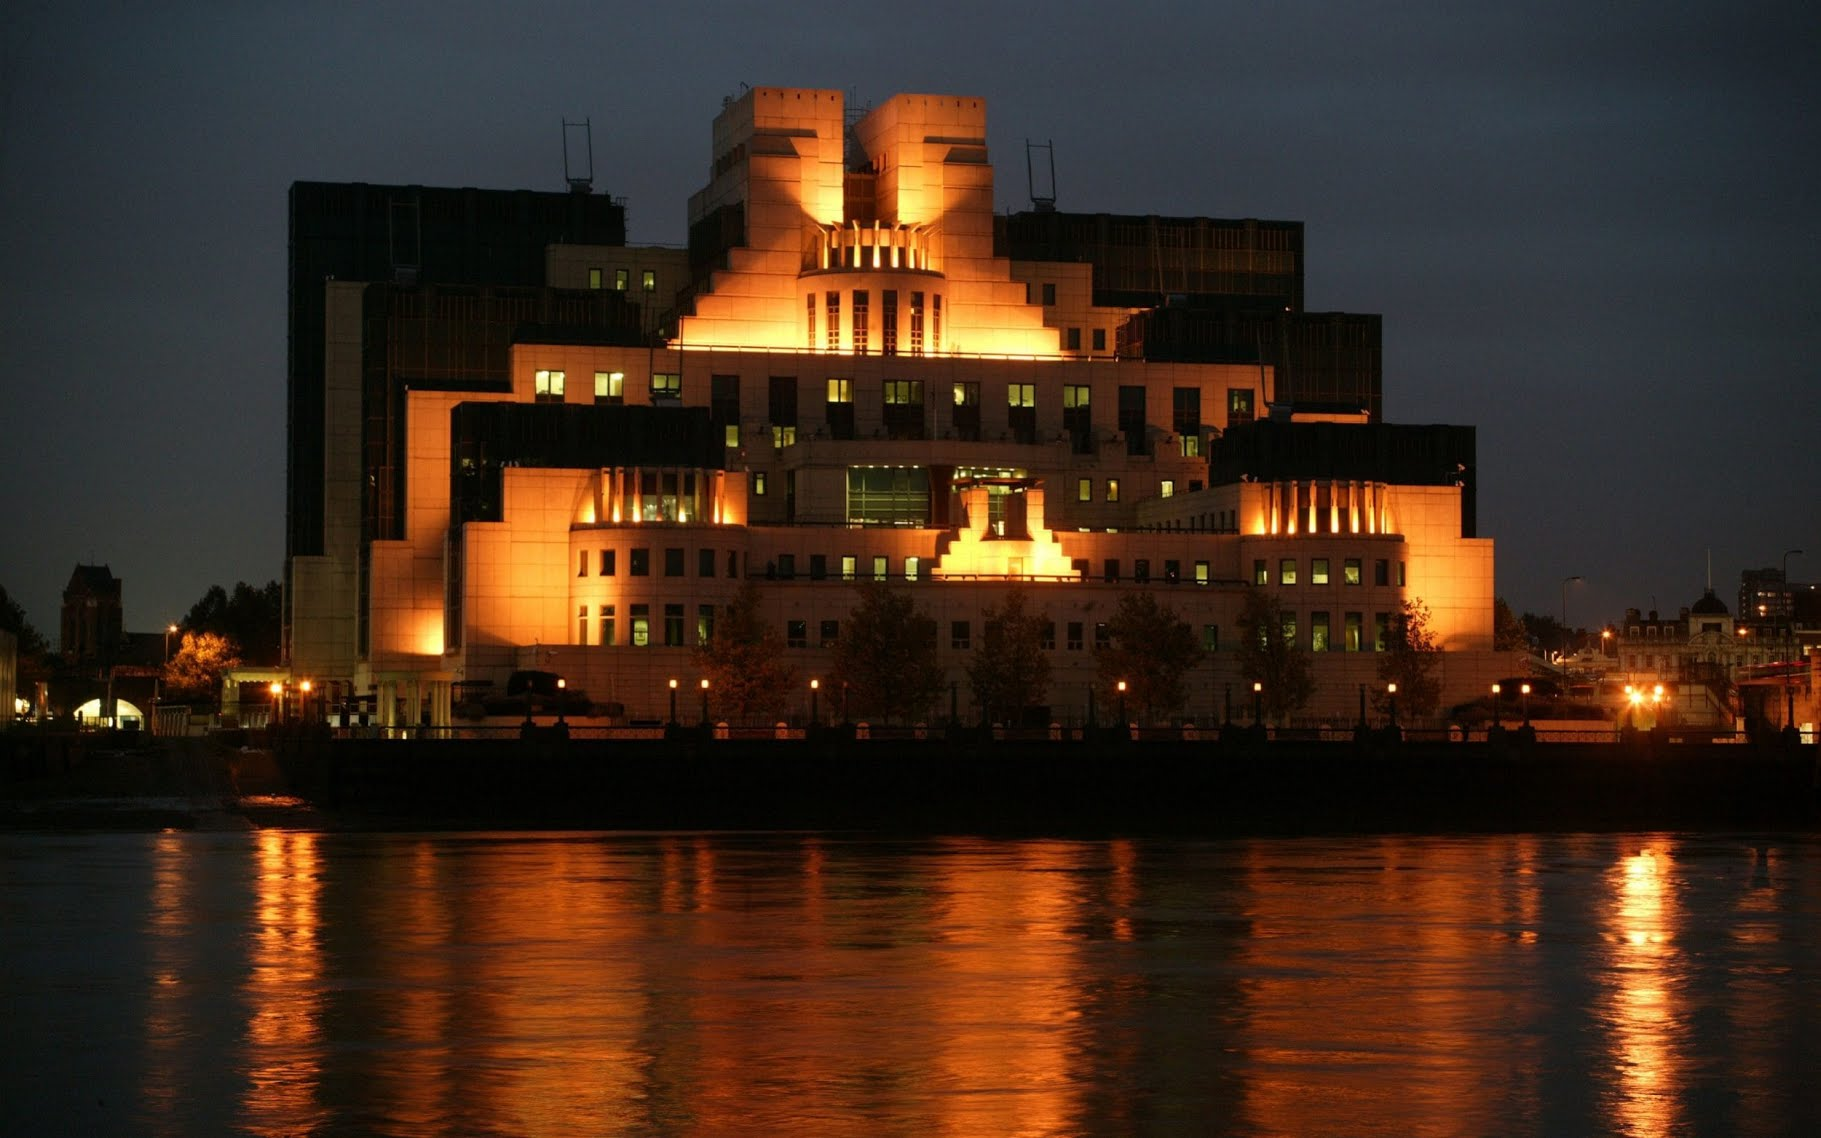 MI6 headquarters in Vauxhall, London.